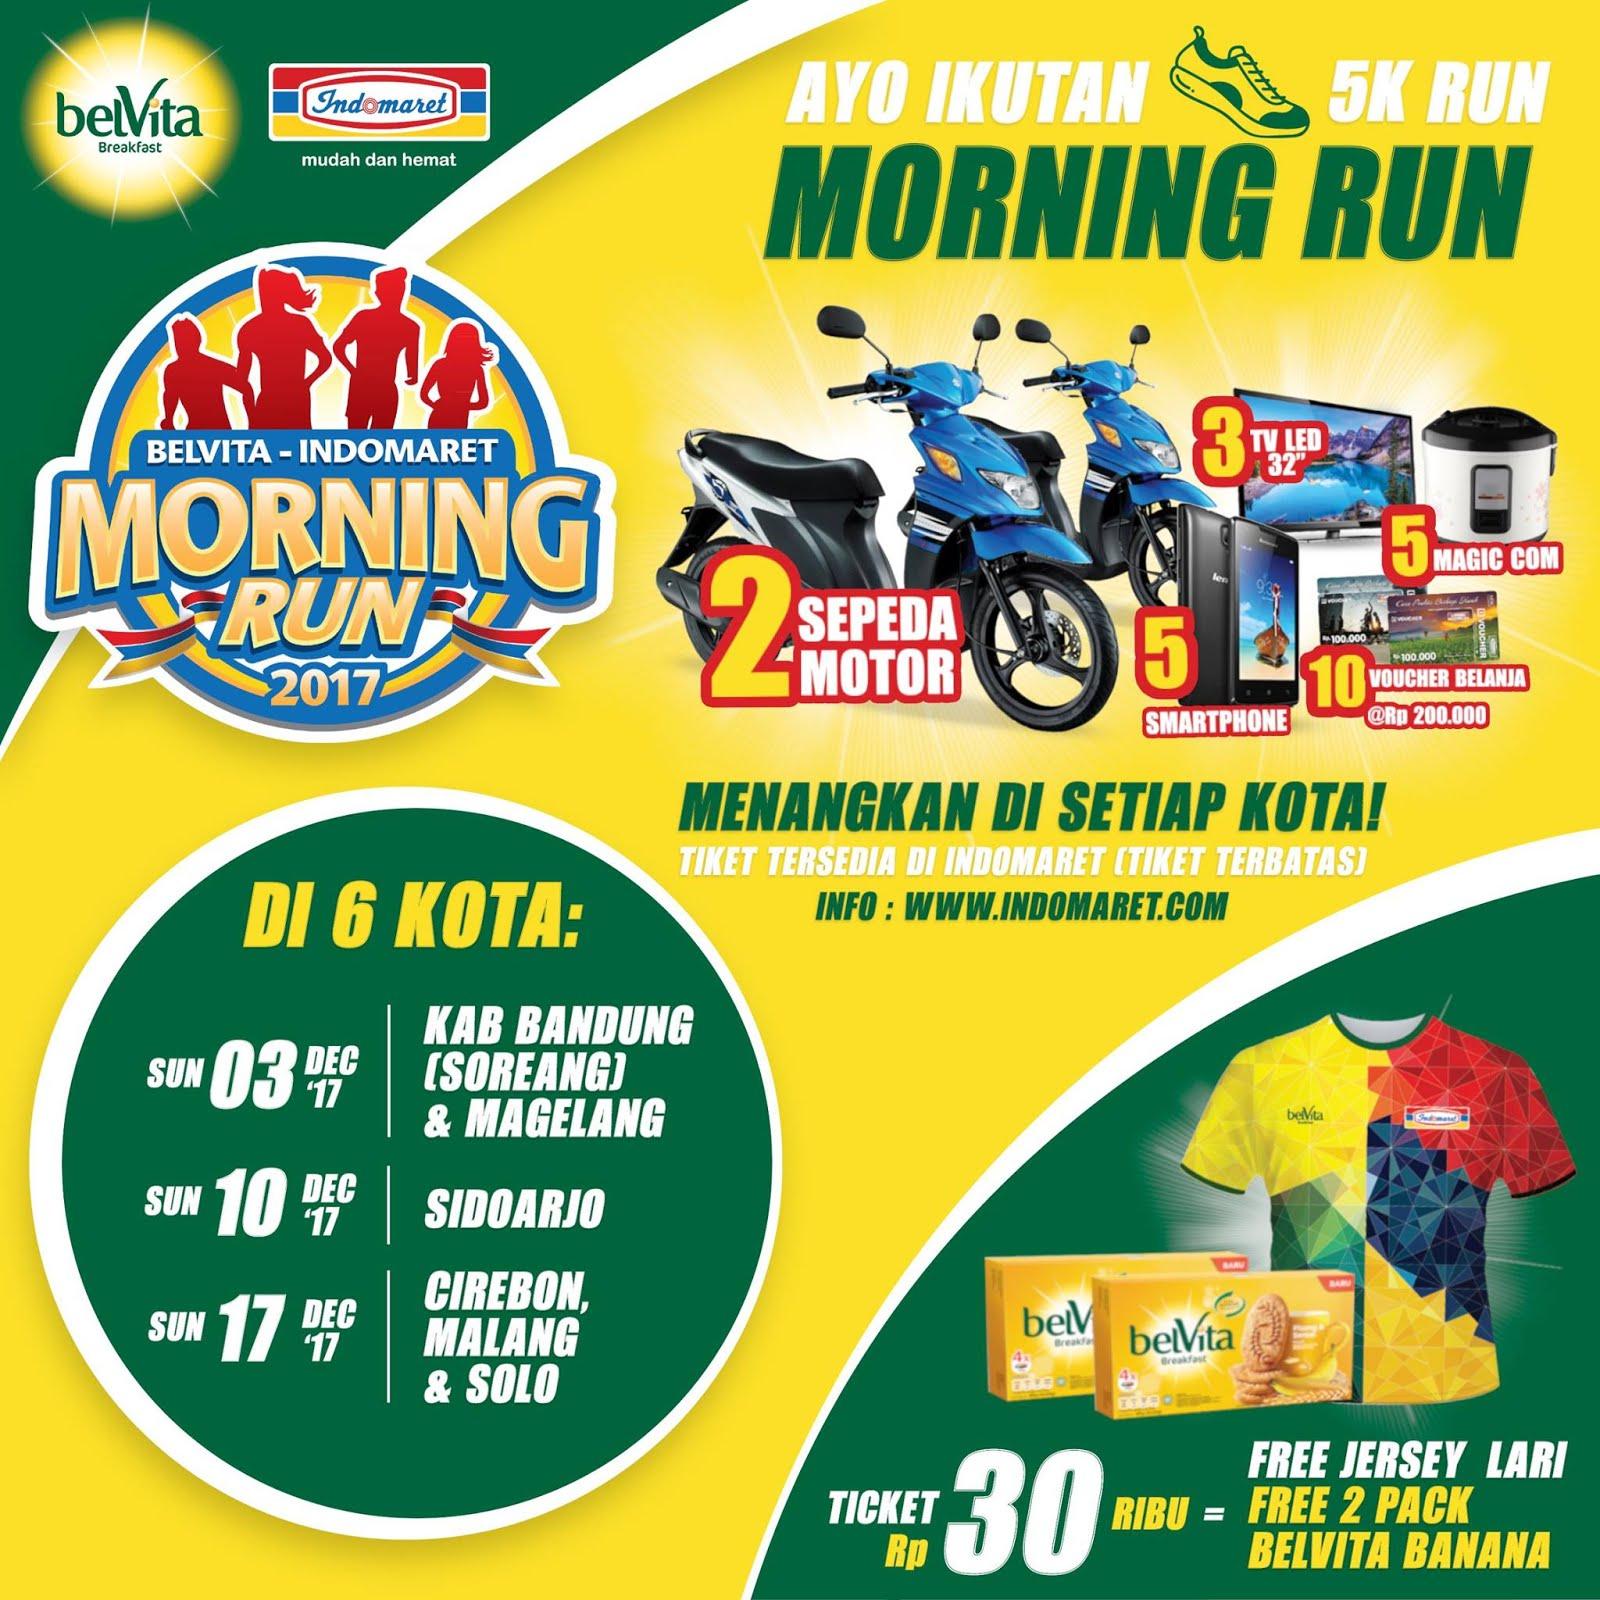 Belvita-Indomaret Morning Run • 2017